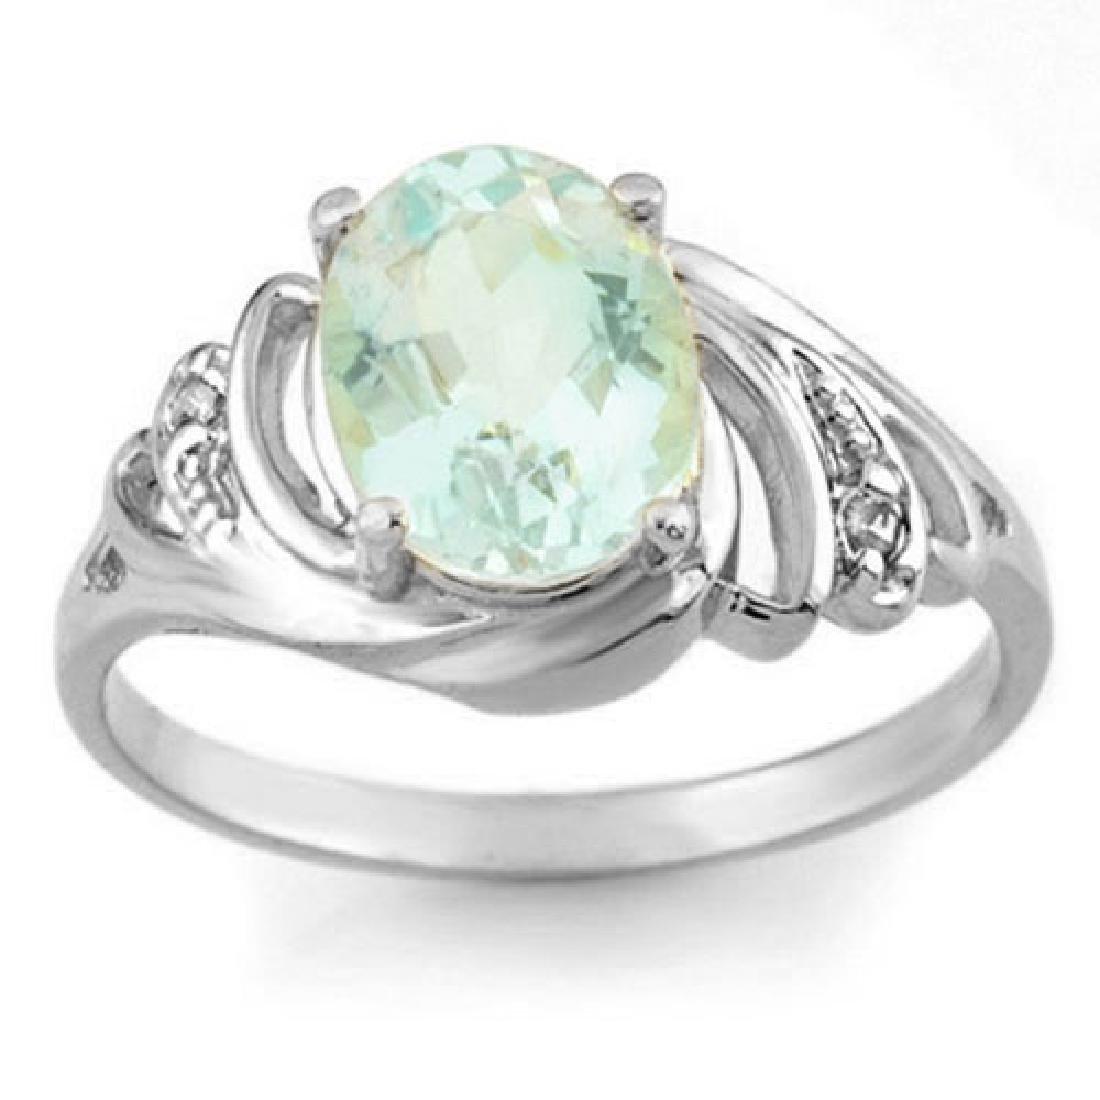 2.04 CTW Aquamarine & Diamond Ring 18K White Gold